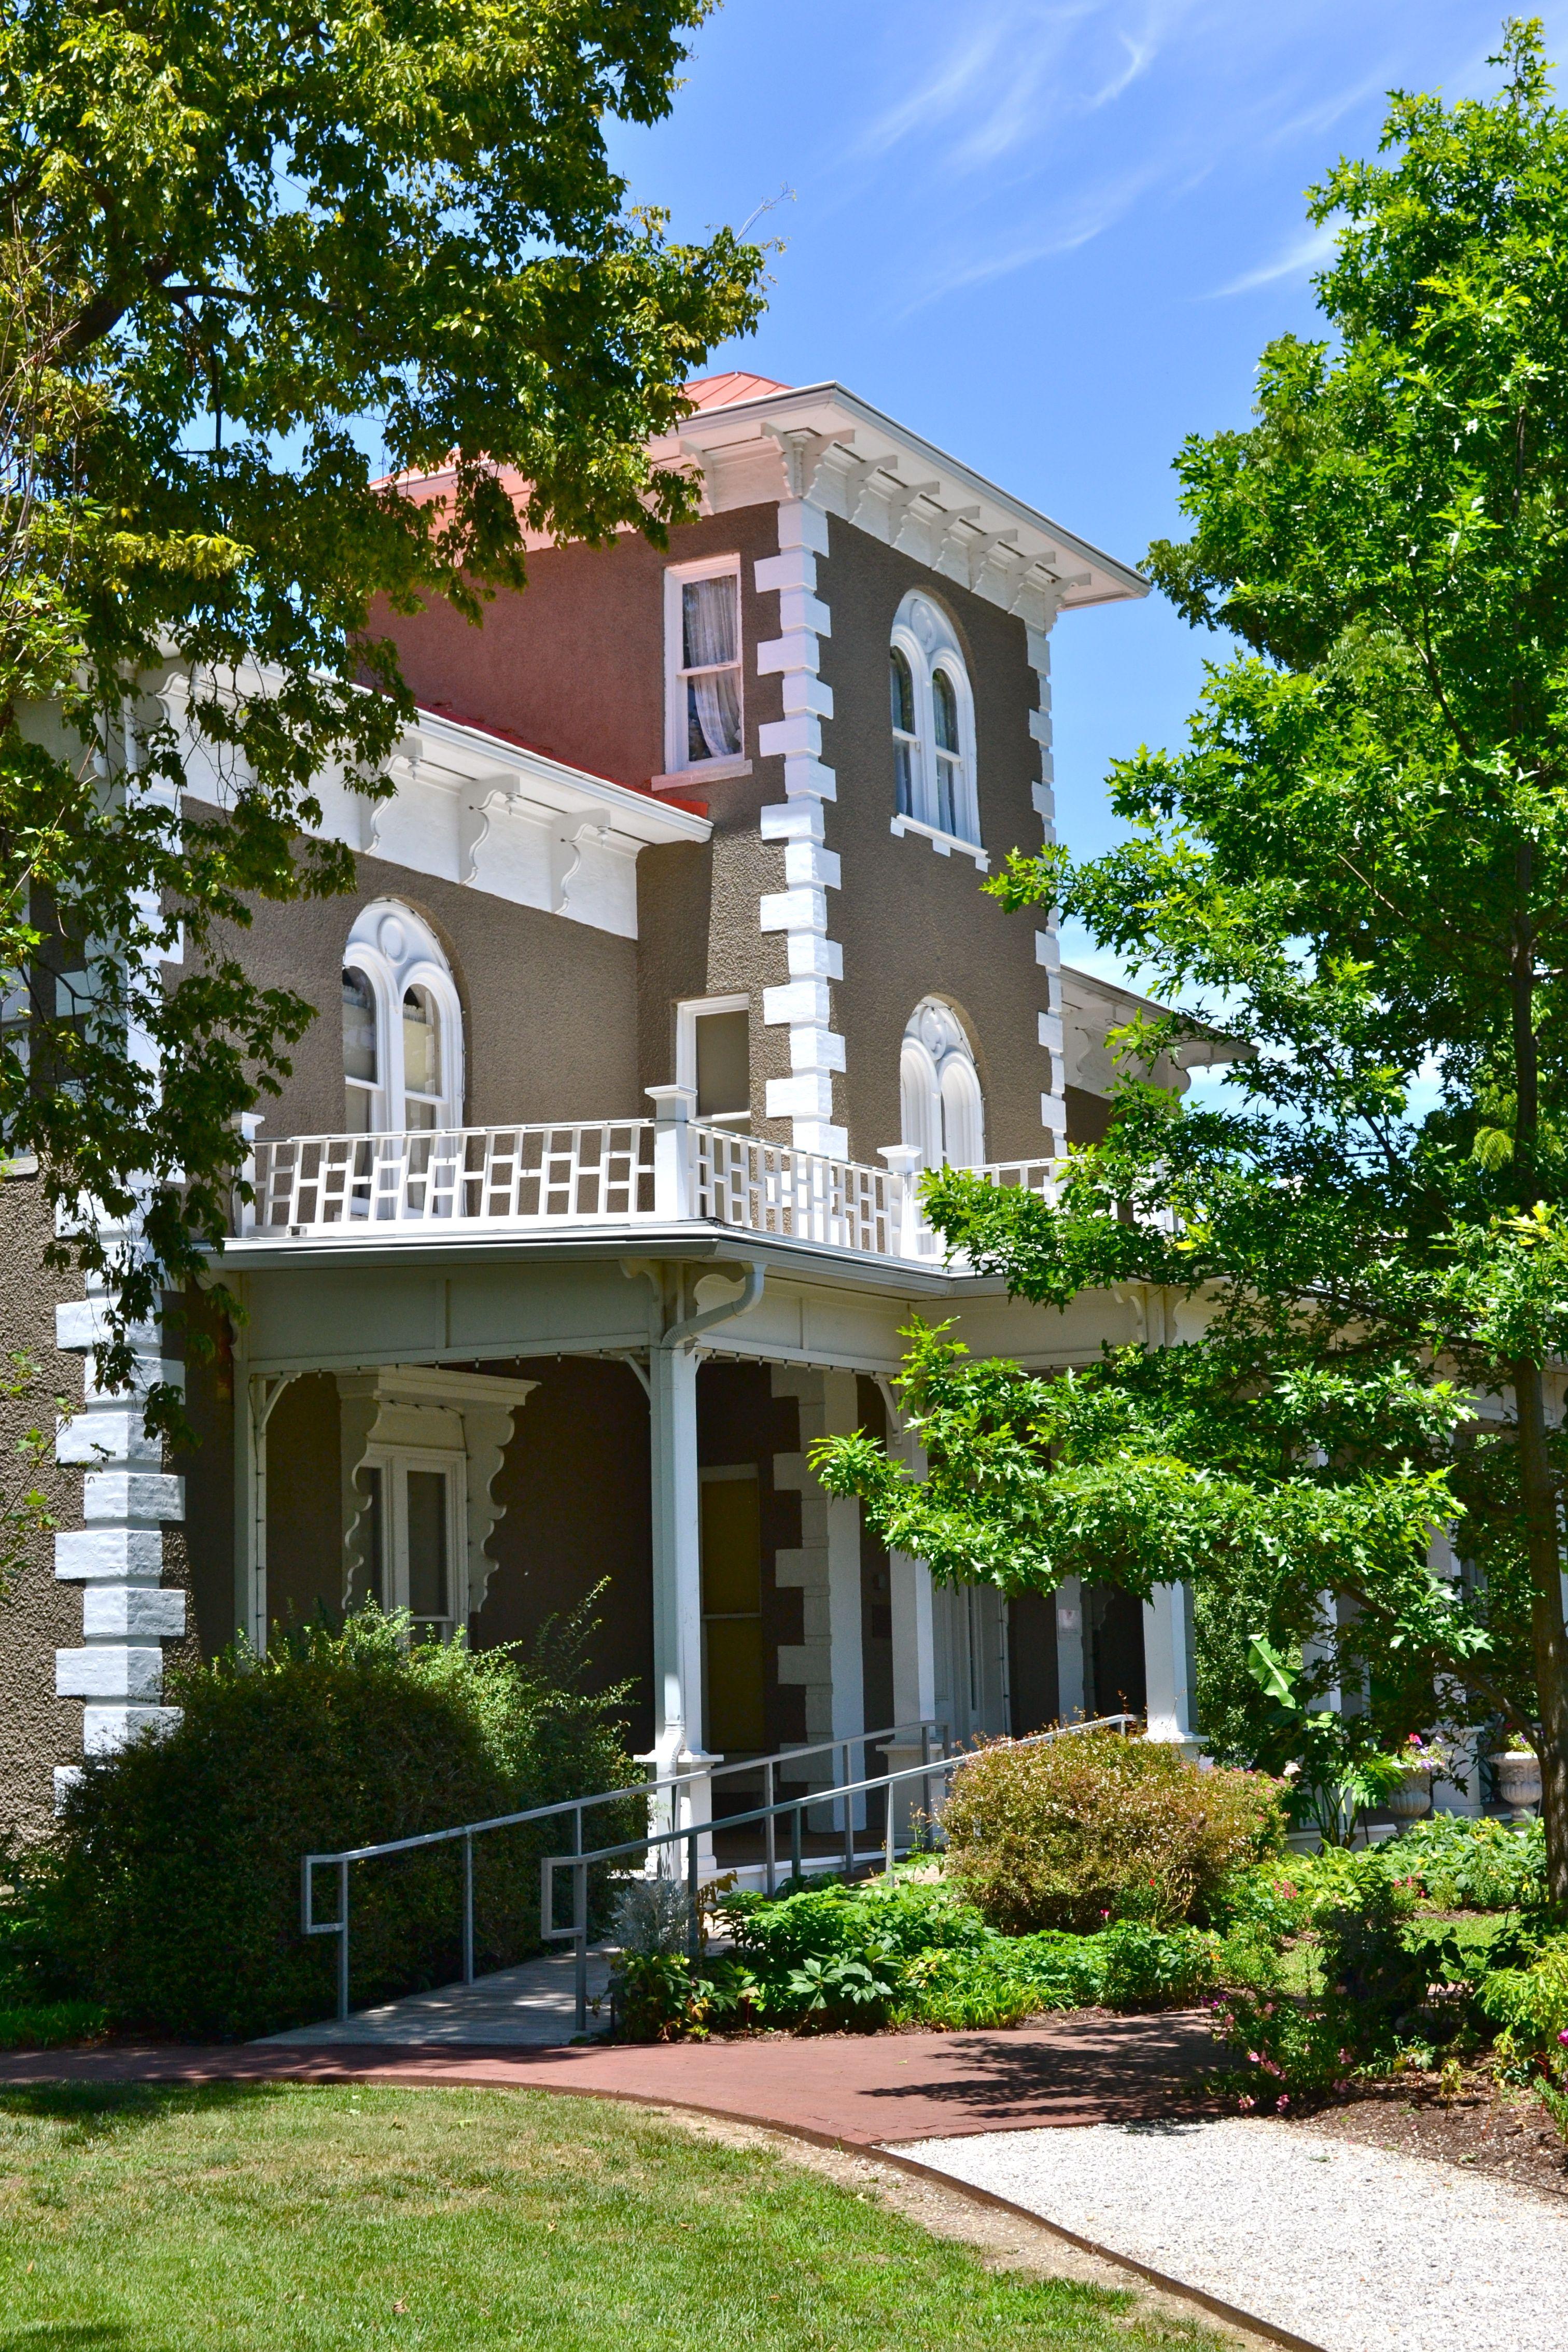 The Peel Mansion Museum Heritage Gardens 400 S Walton Blvd Bentonville Ar 72712